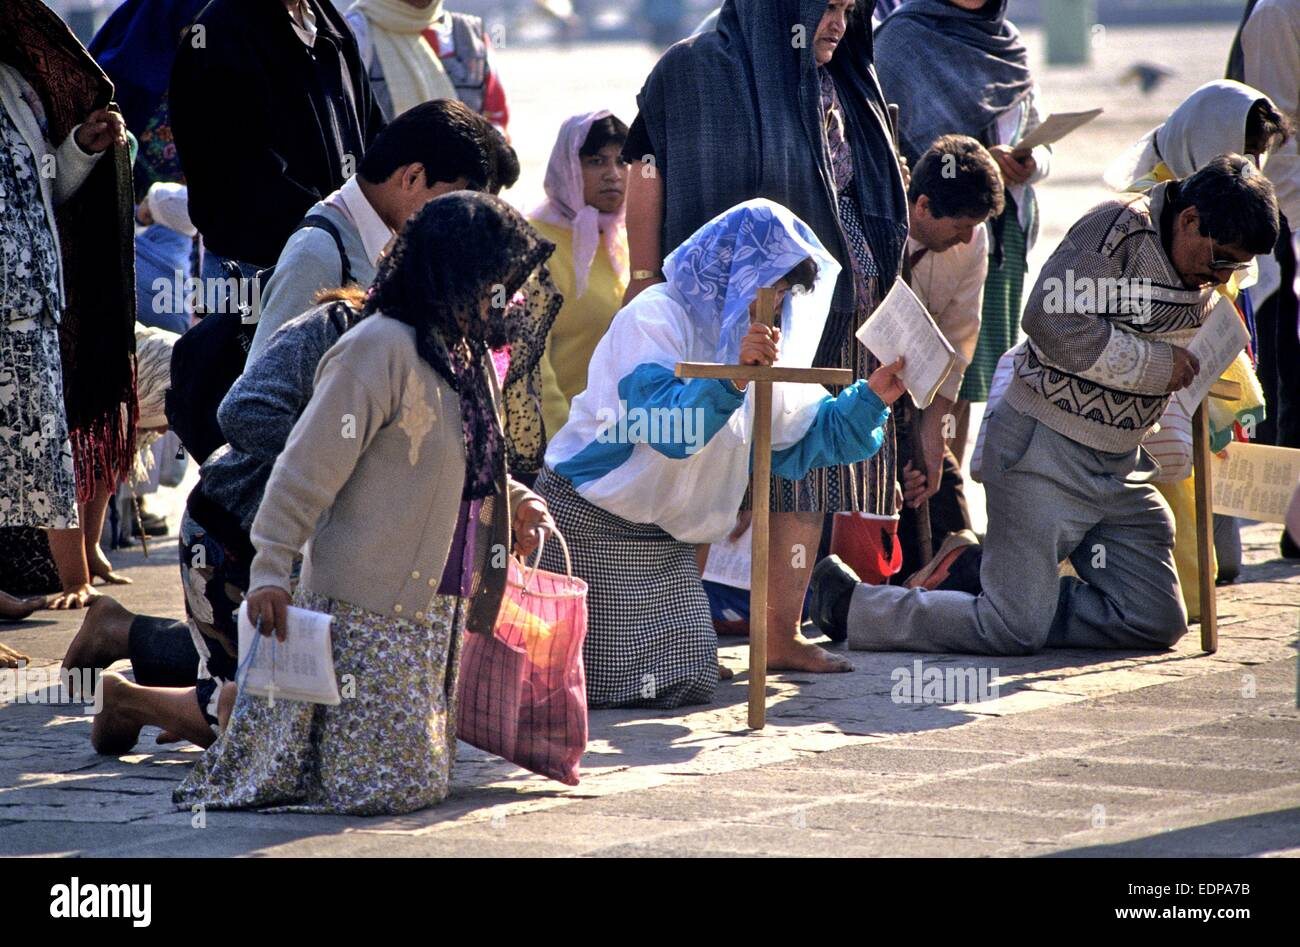 Mexico - pilgrims in Mexico City - Stock Image